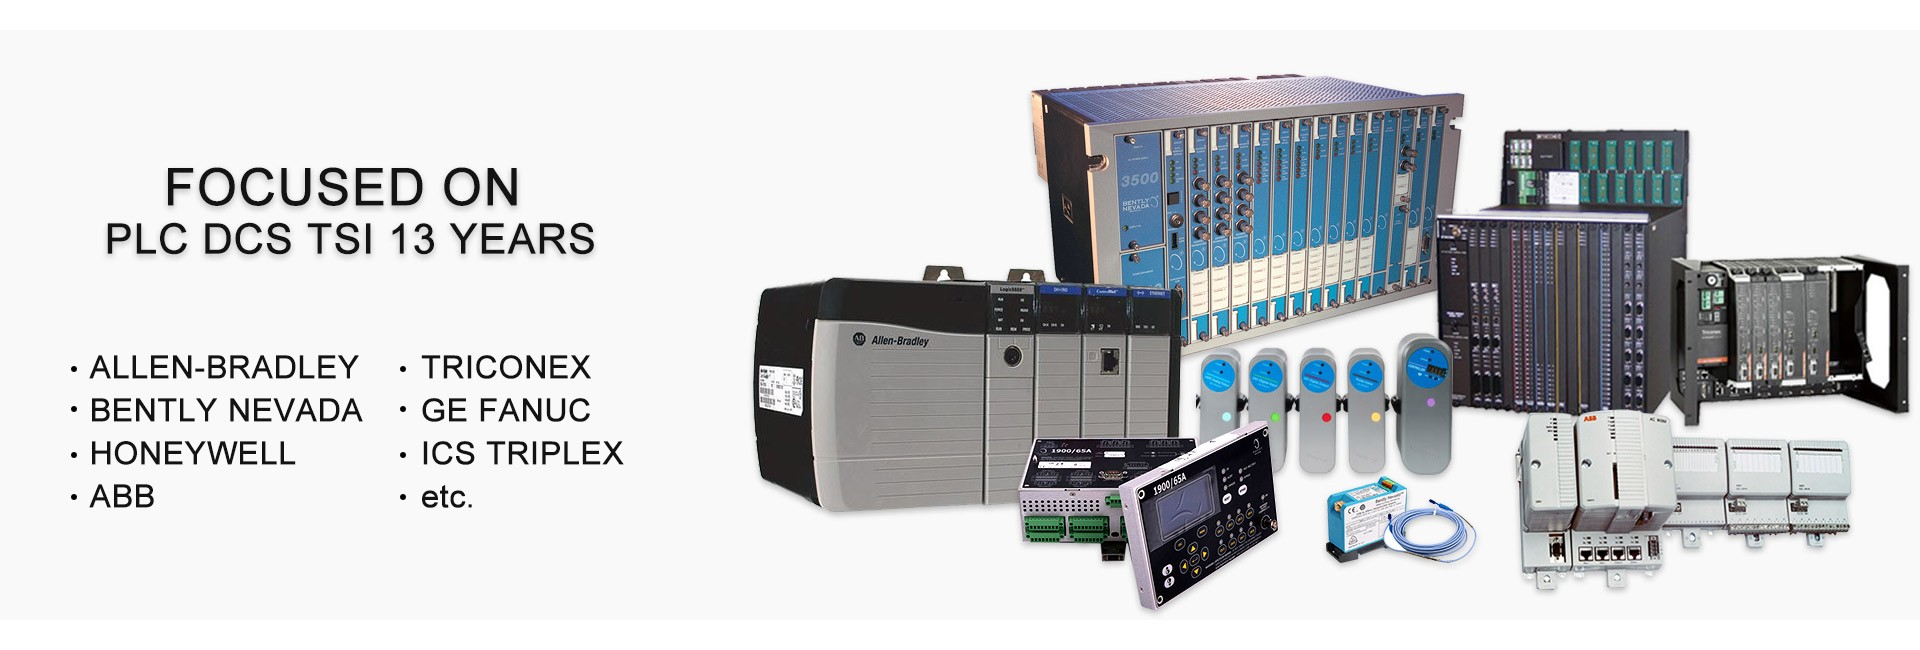 PLC Processor